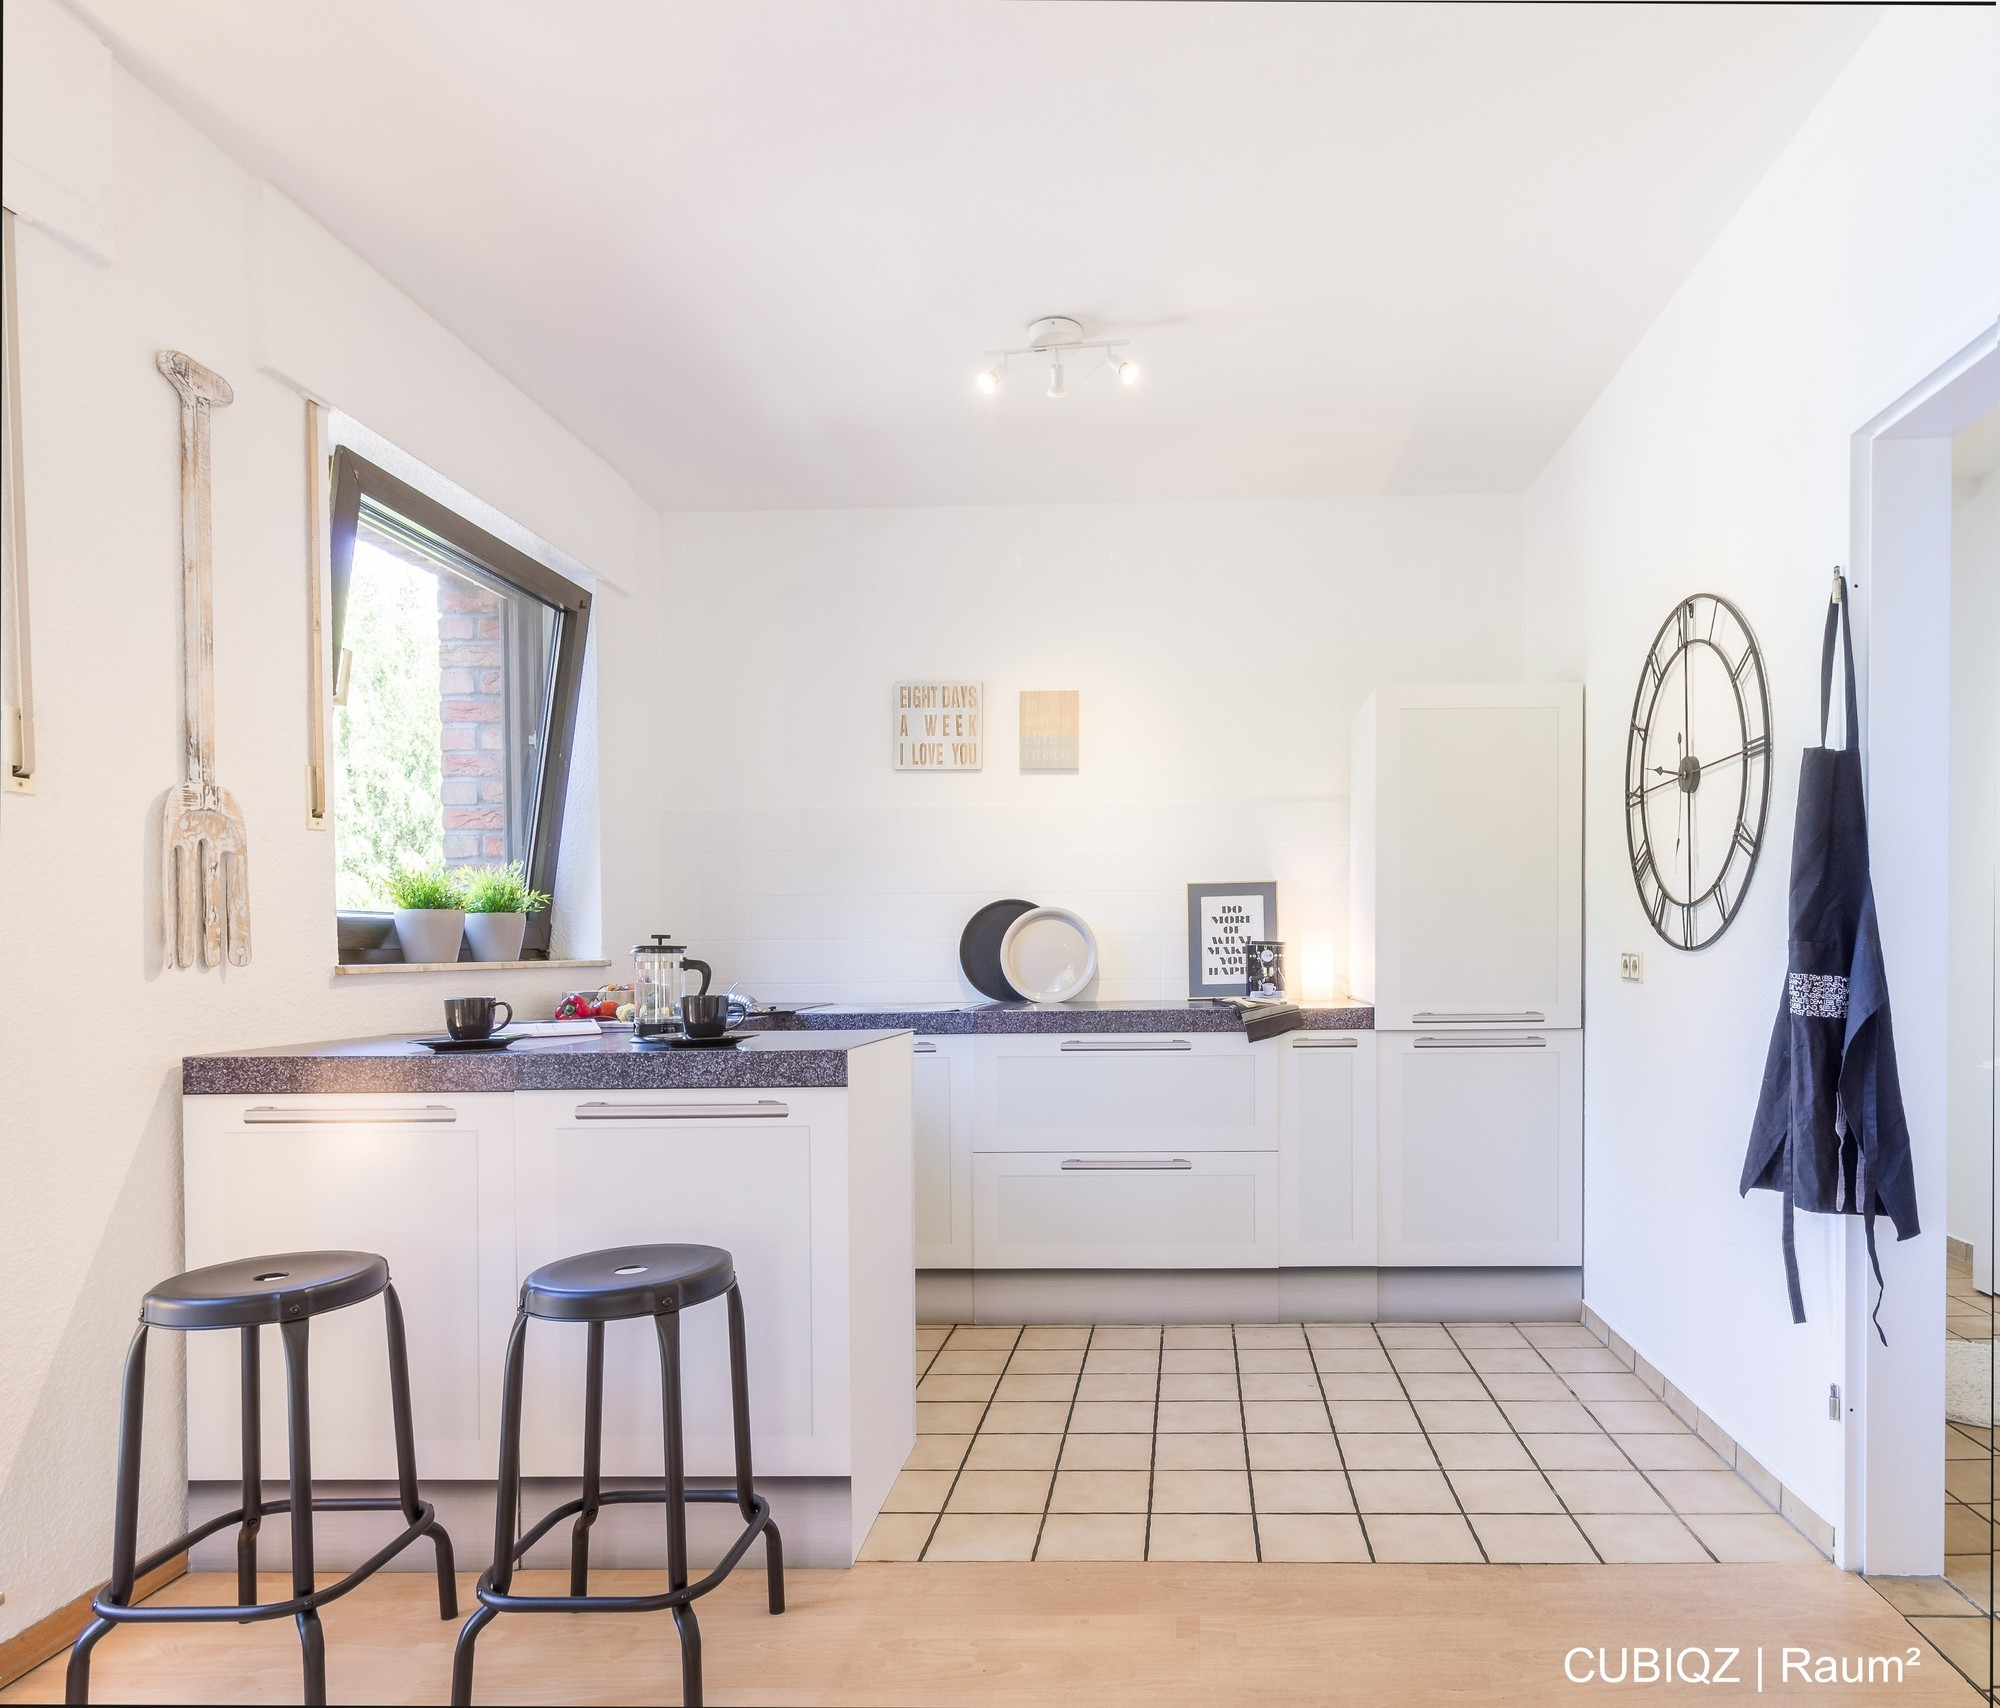 HomeStaging con cucine in cartone cubiqz 1B